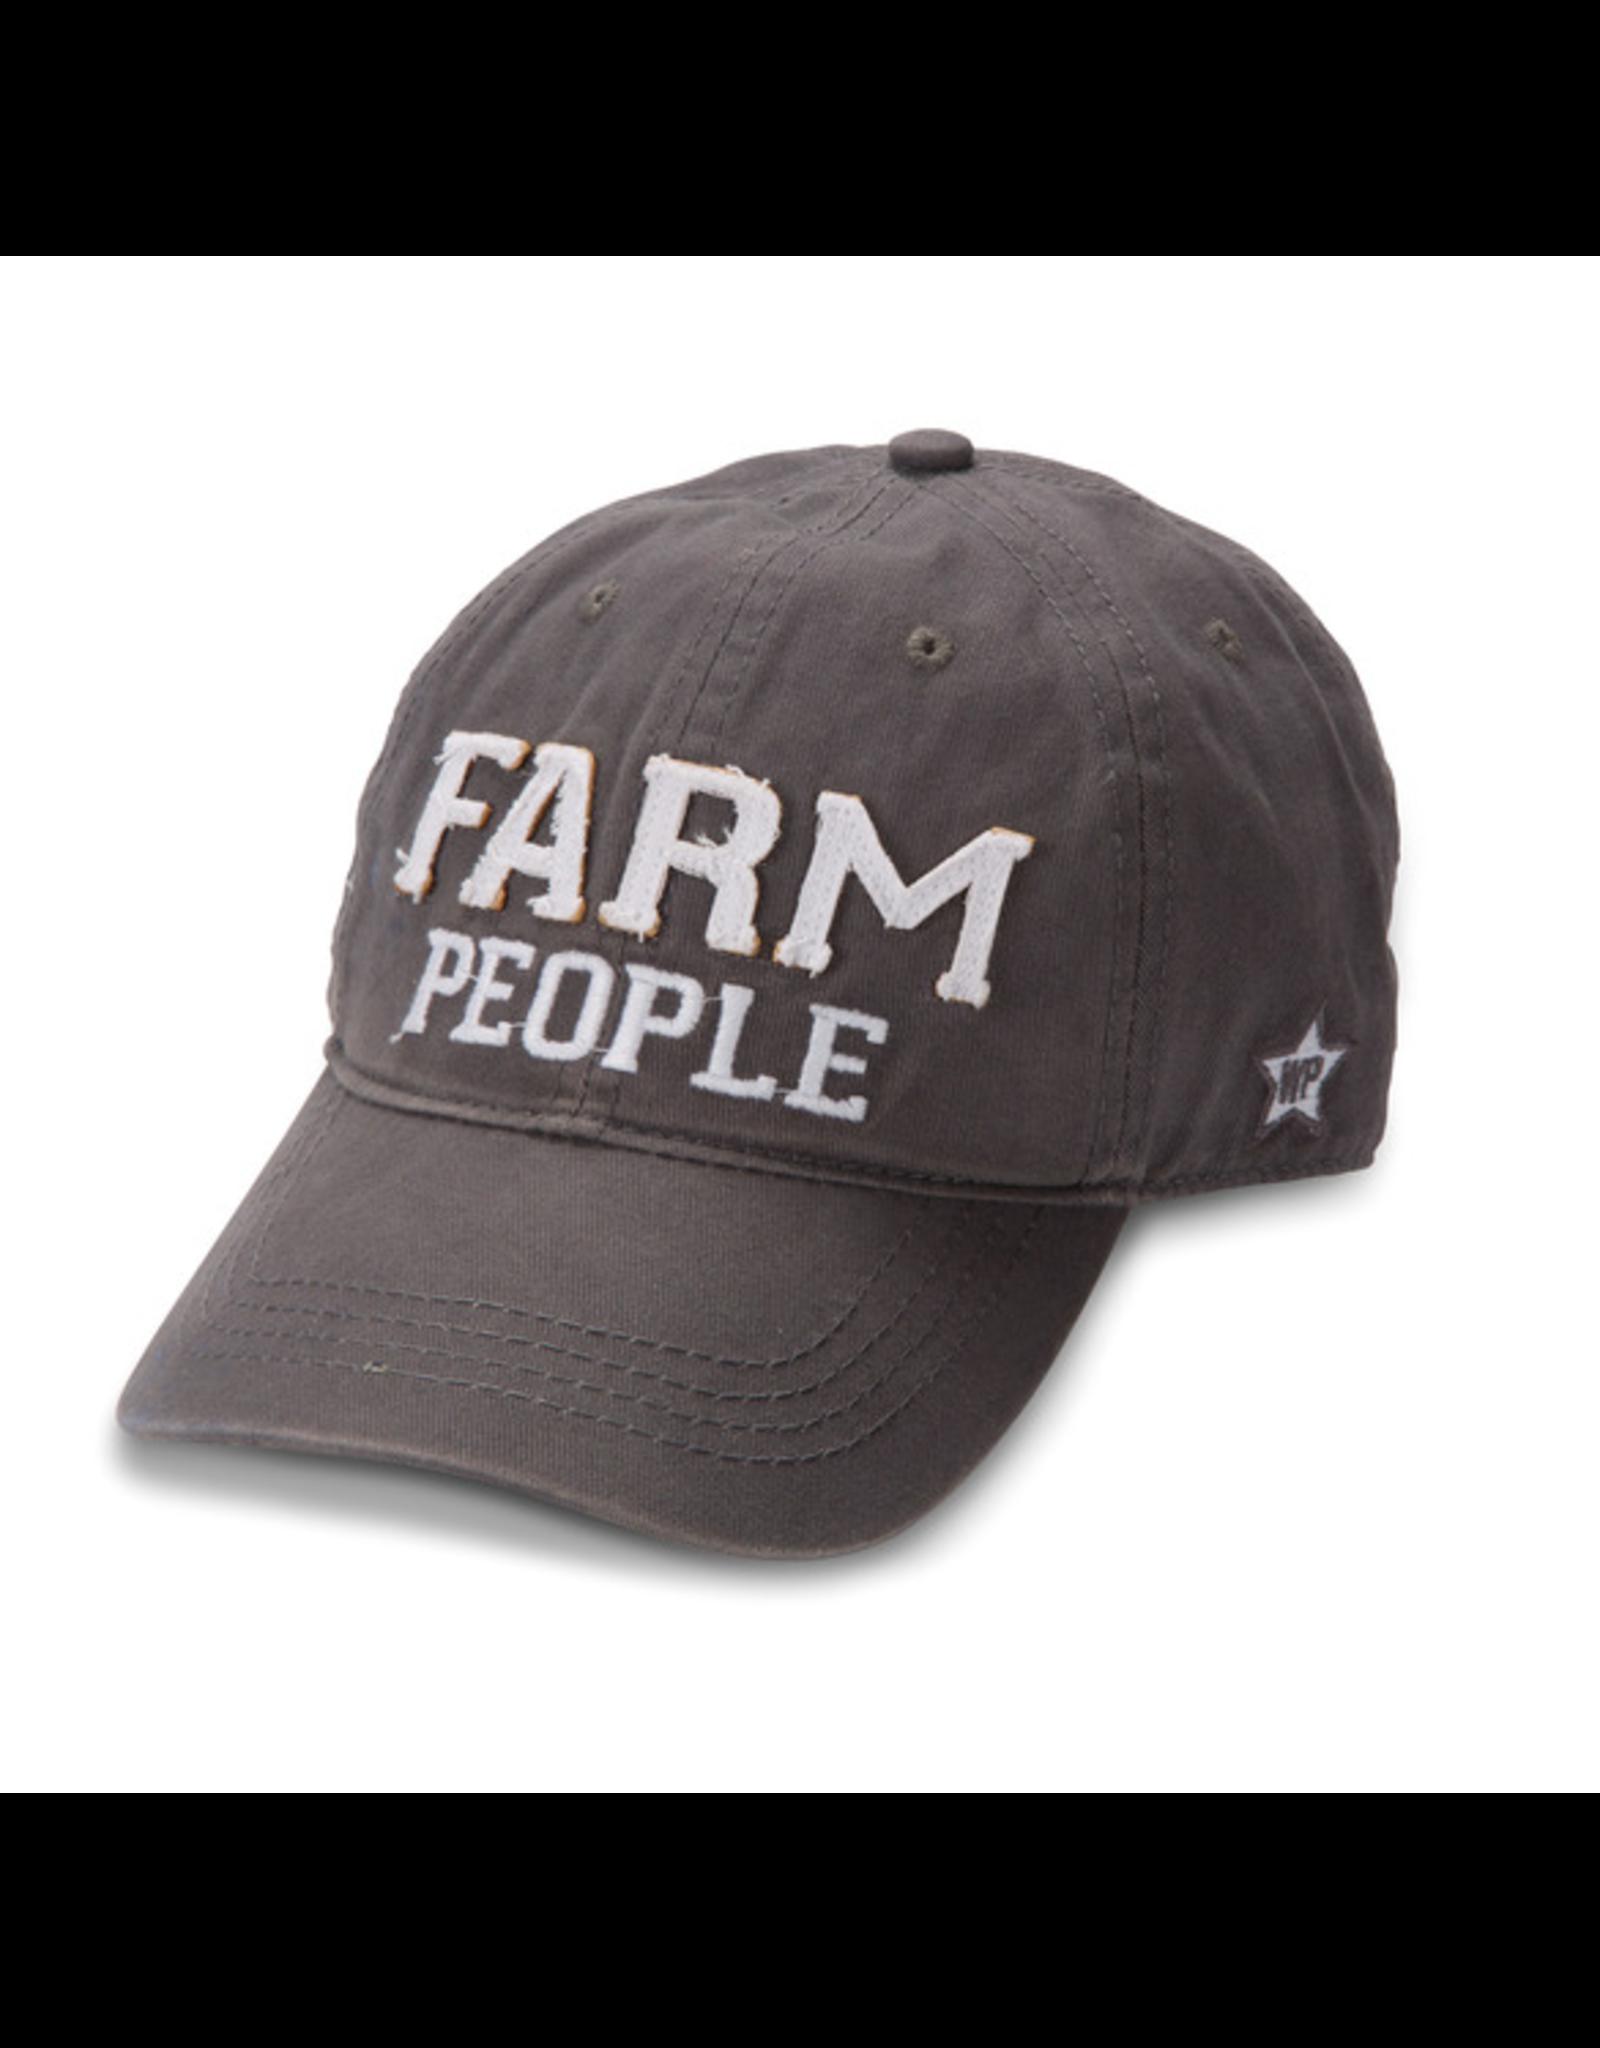 Farm People Ball Hat, grey